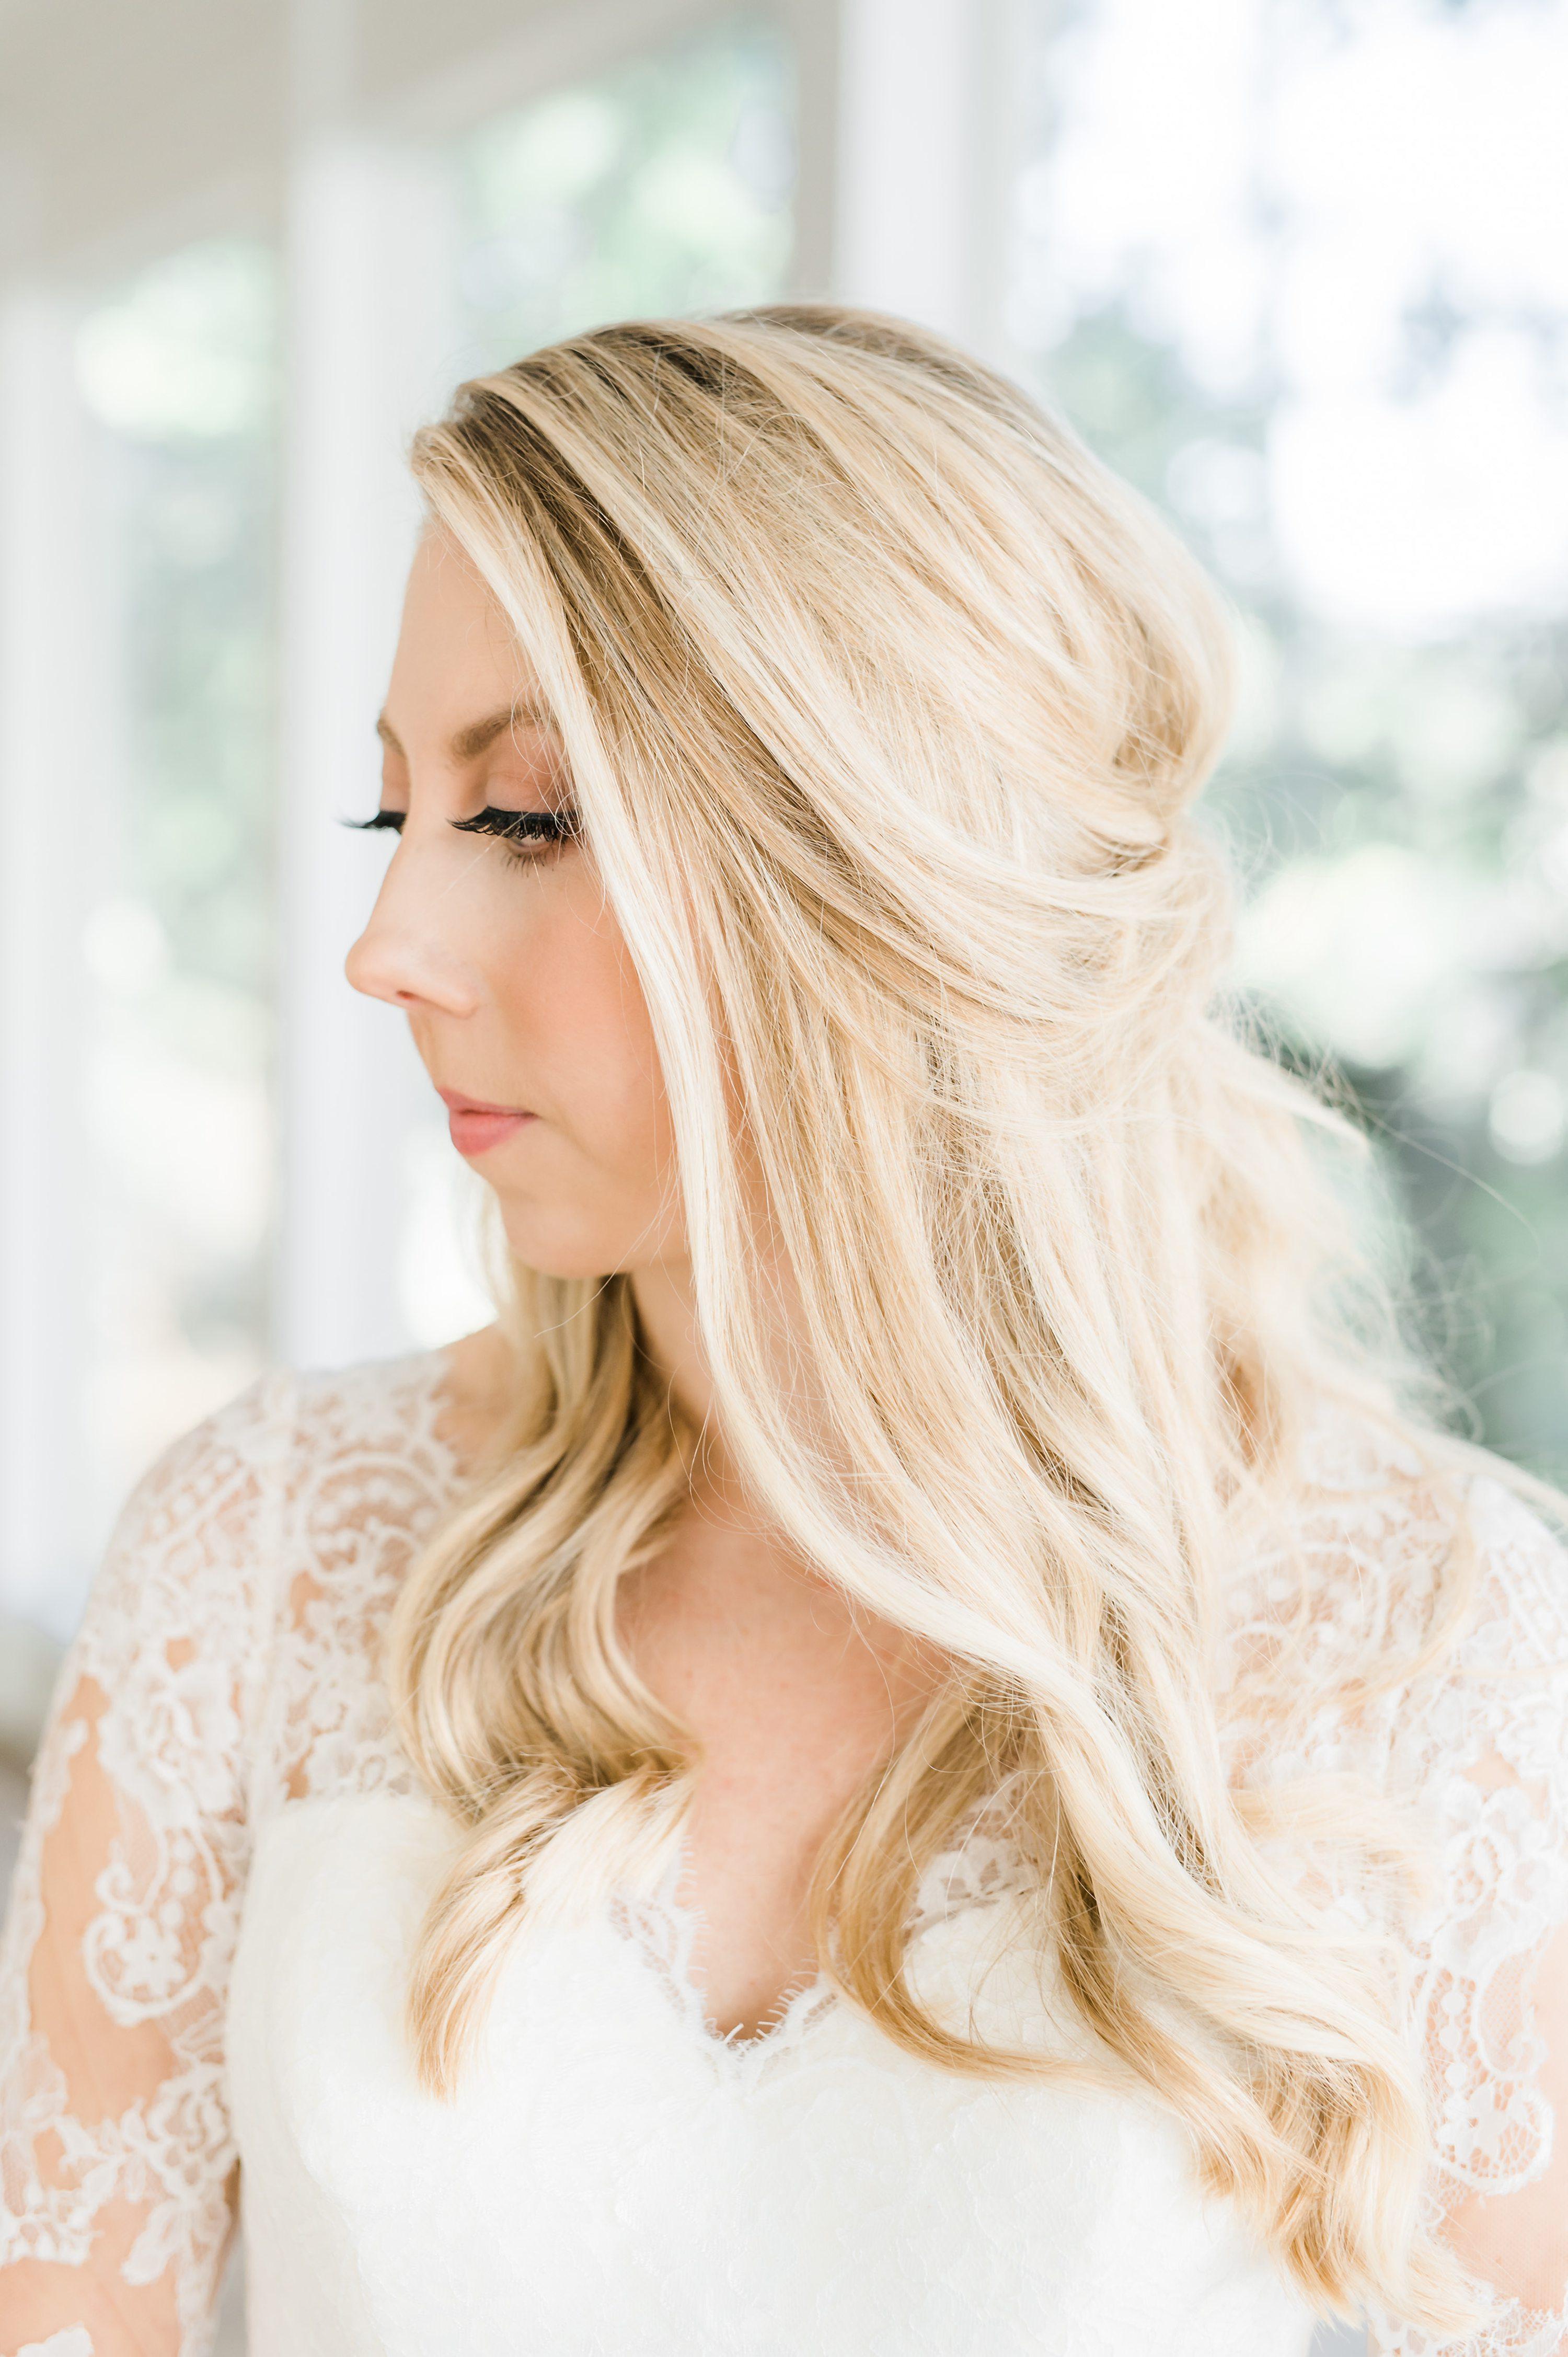 Eric & Jenn Photography,Houston Wedding Photographer